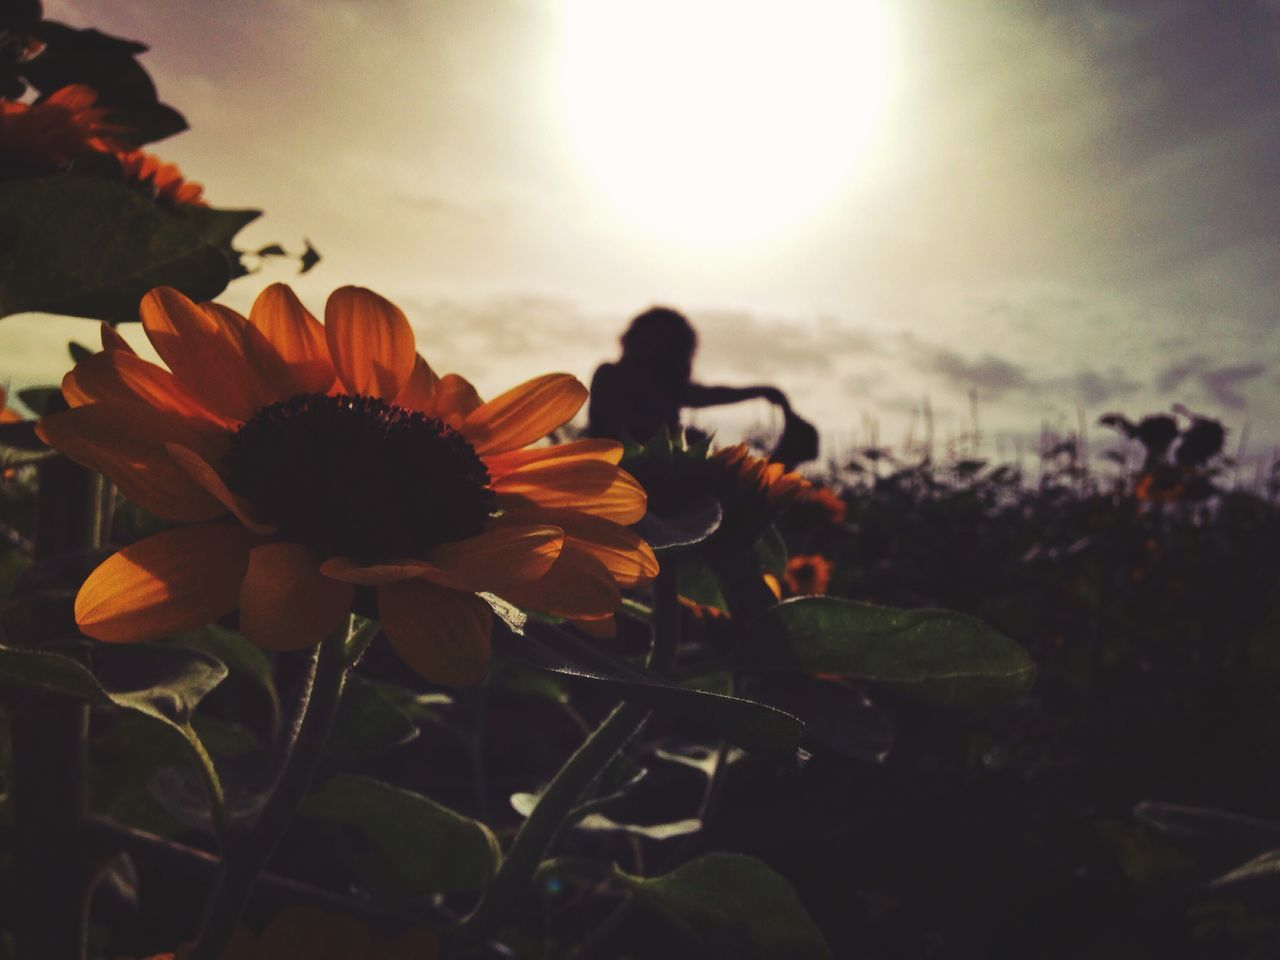 Friends & sunflowers ❤️🌻 IPhoneography Nature Sunflower EyeEm Best Shots Silhouette NEM Memories Creative Light And Shadow